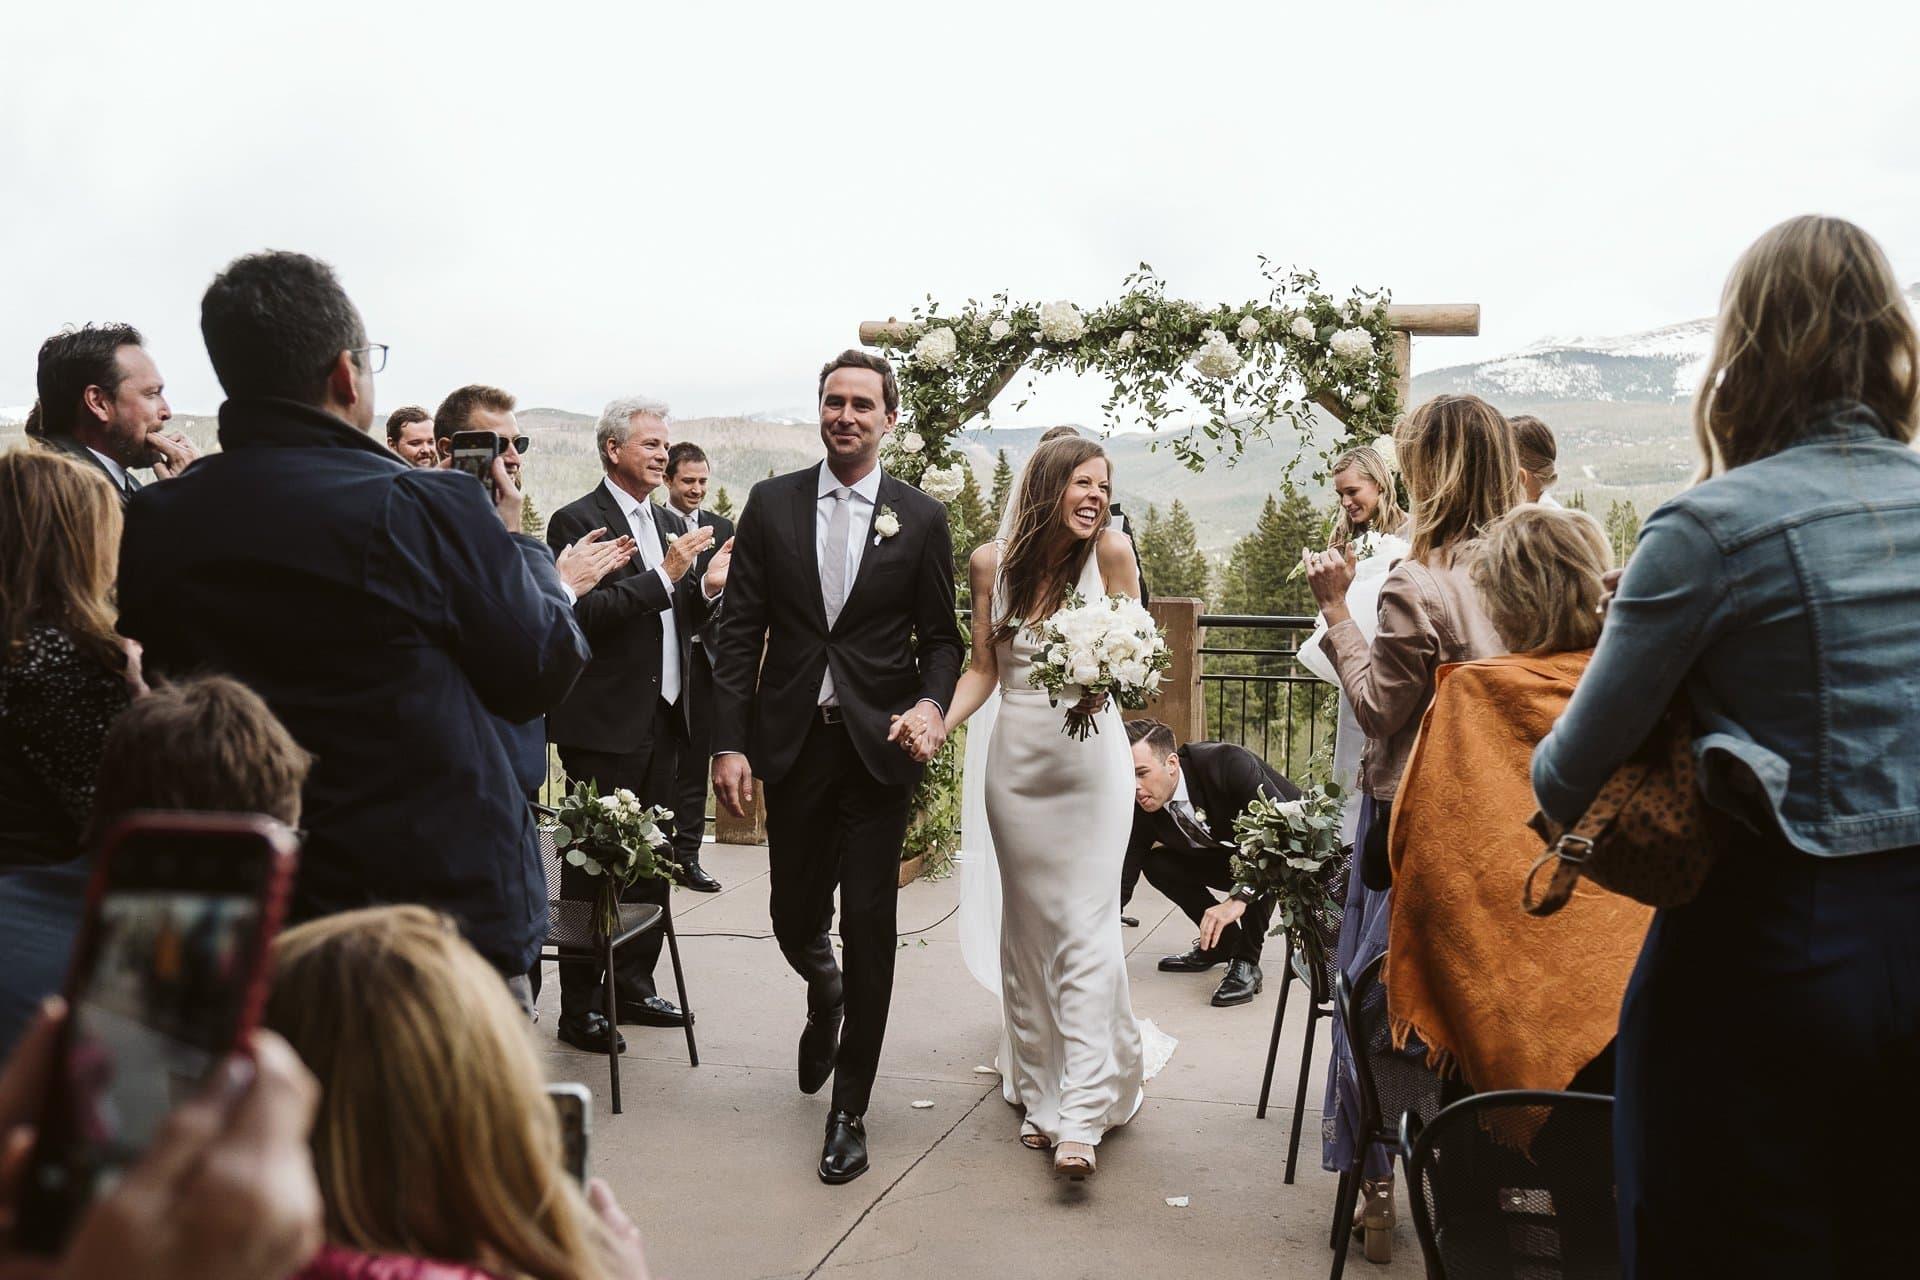 Bride and groom recessional, Wedding ceremony at Sevens at Breckenridge Ski Resort, Colorado mountain wedding photographer